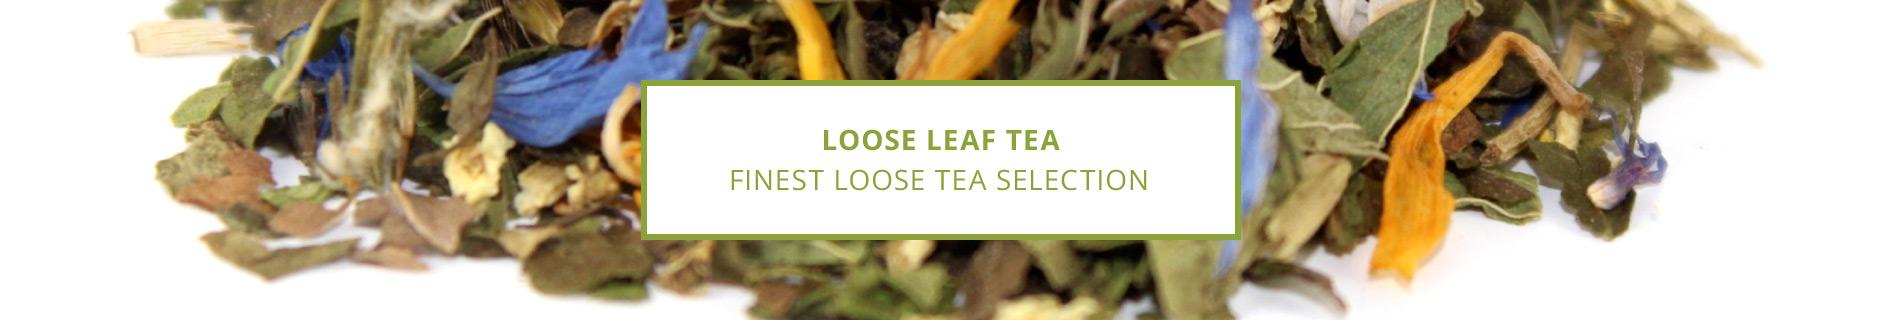 loose-leaf-category.jpg